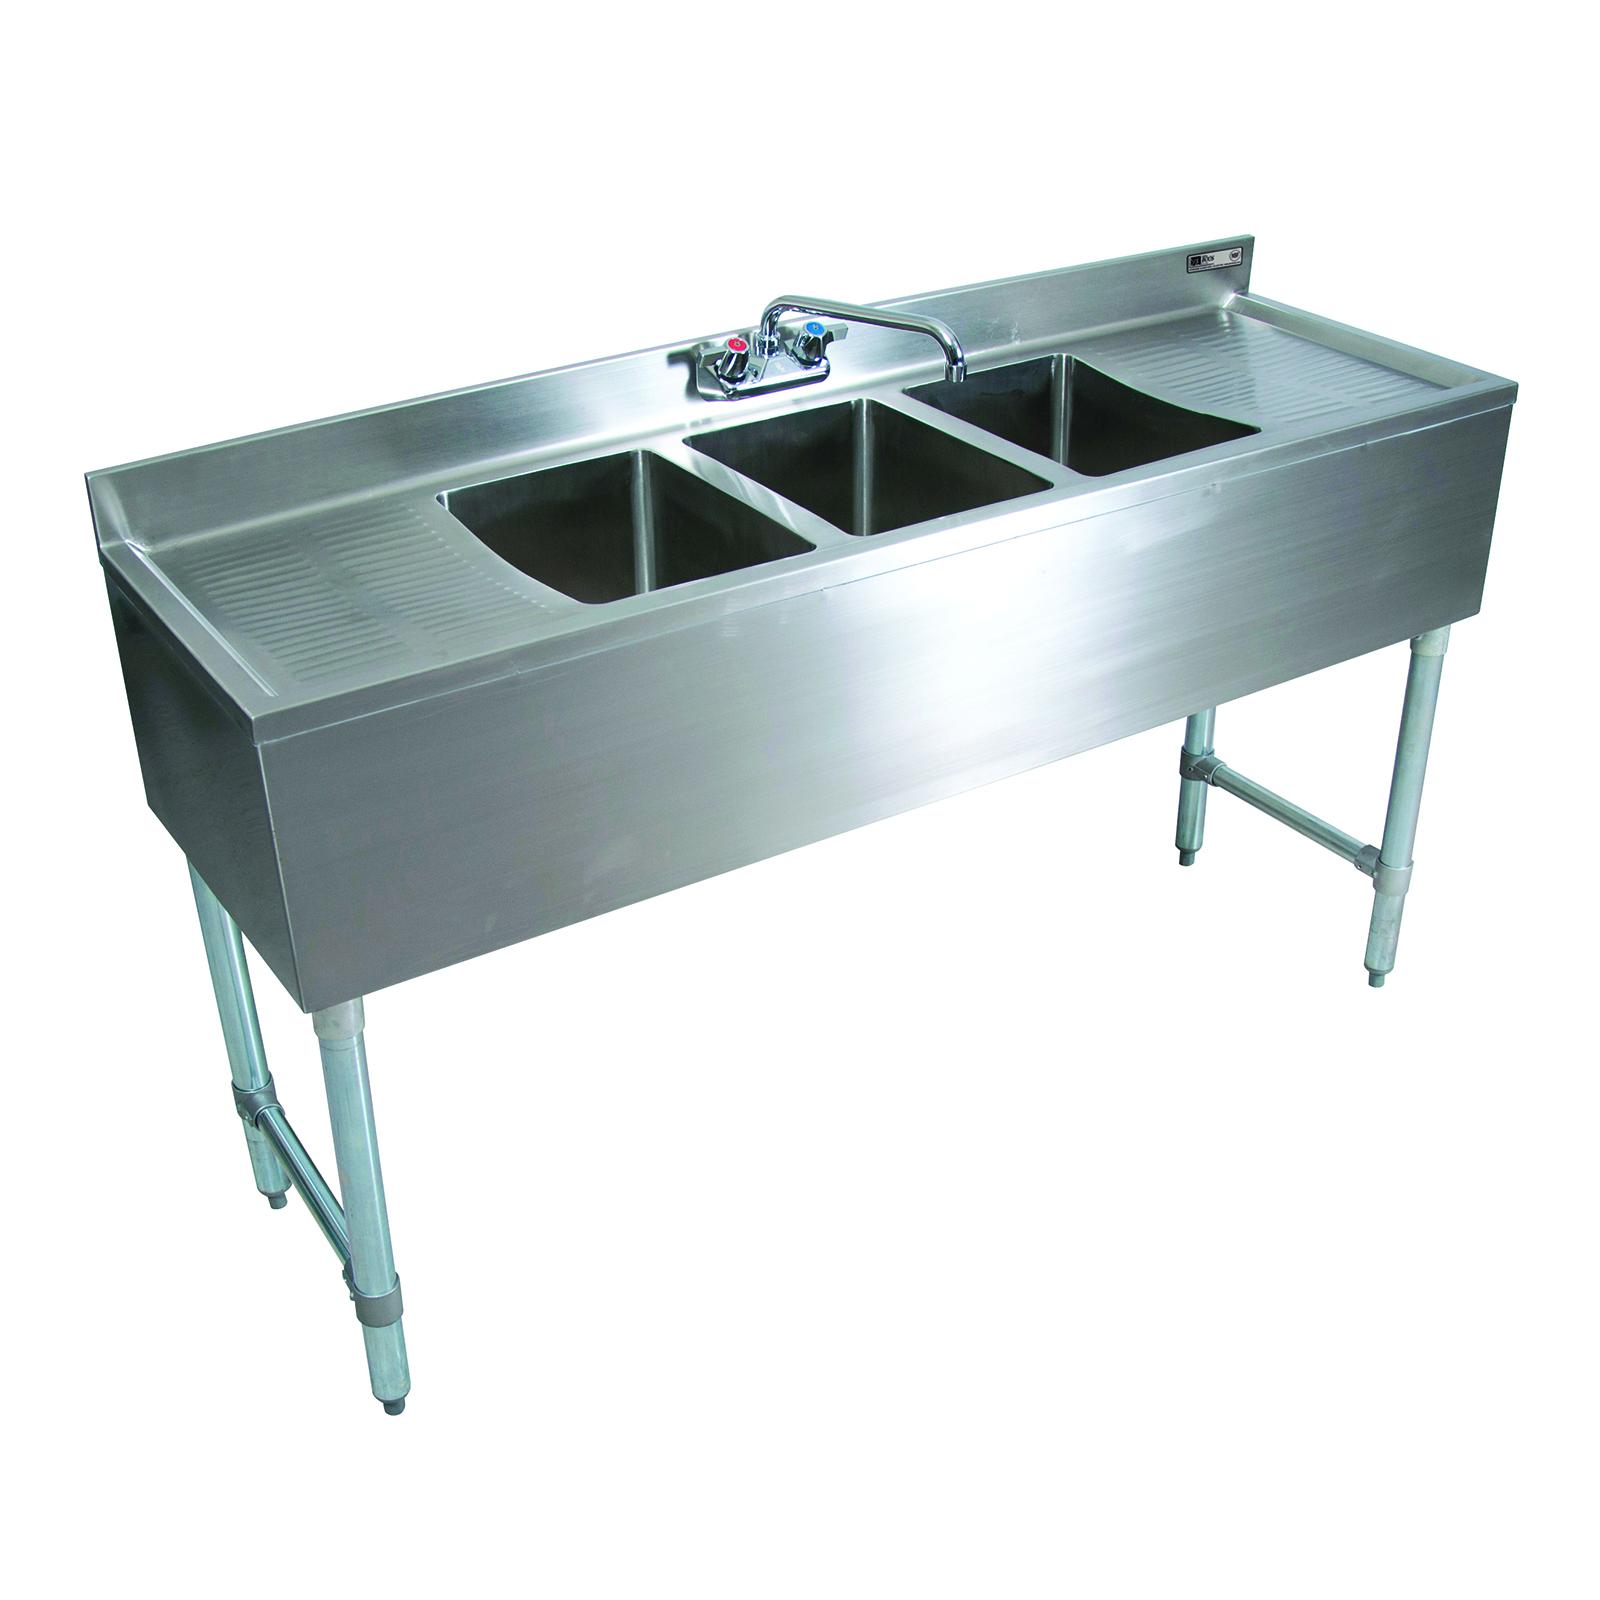 John Boos EUB2S48SL-2D underbar sink units